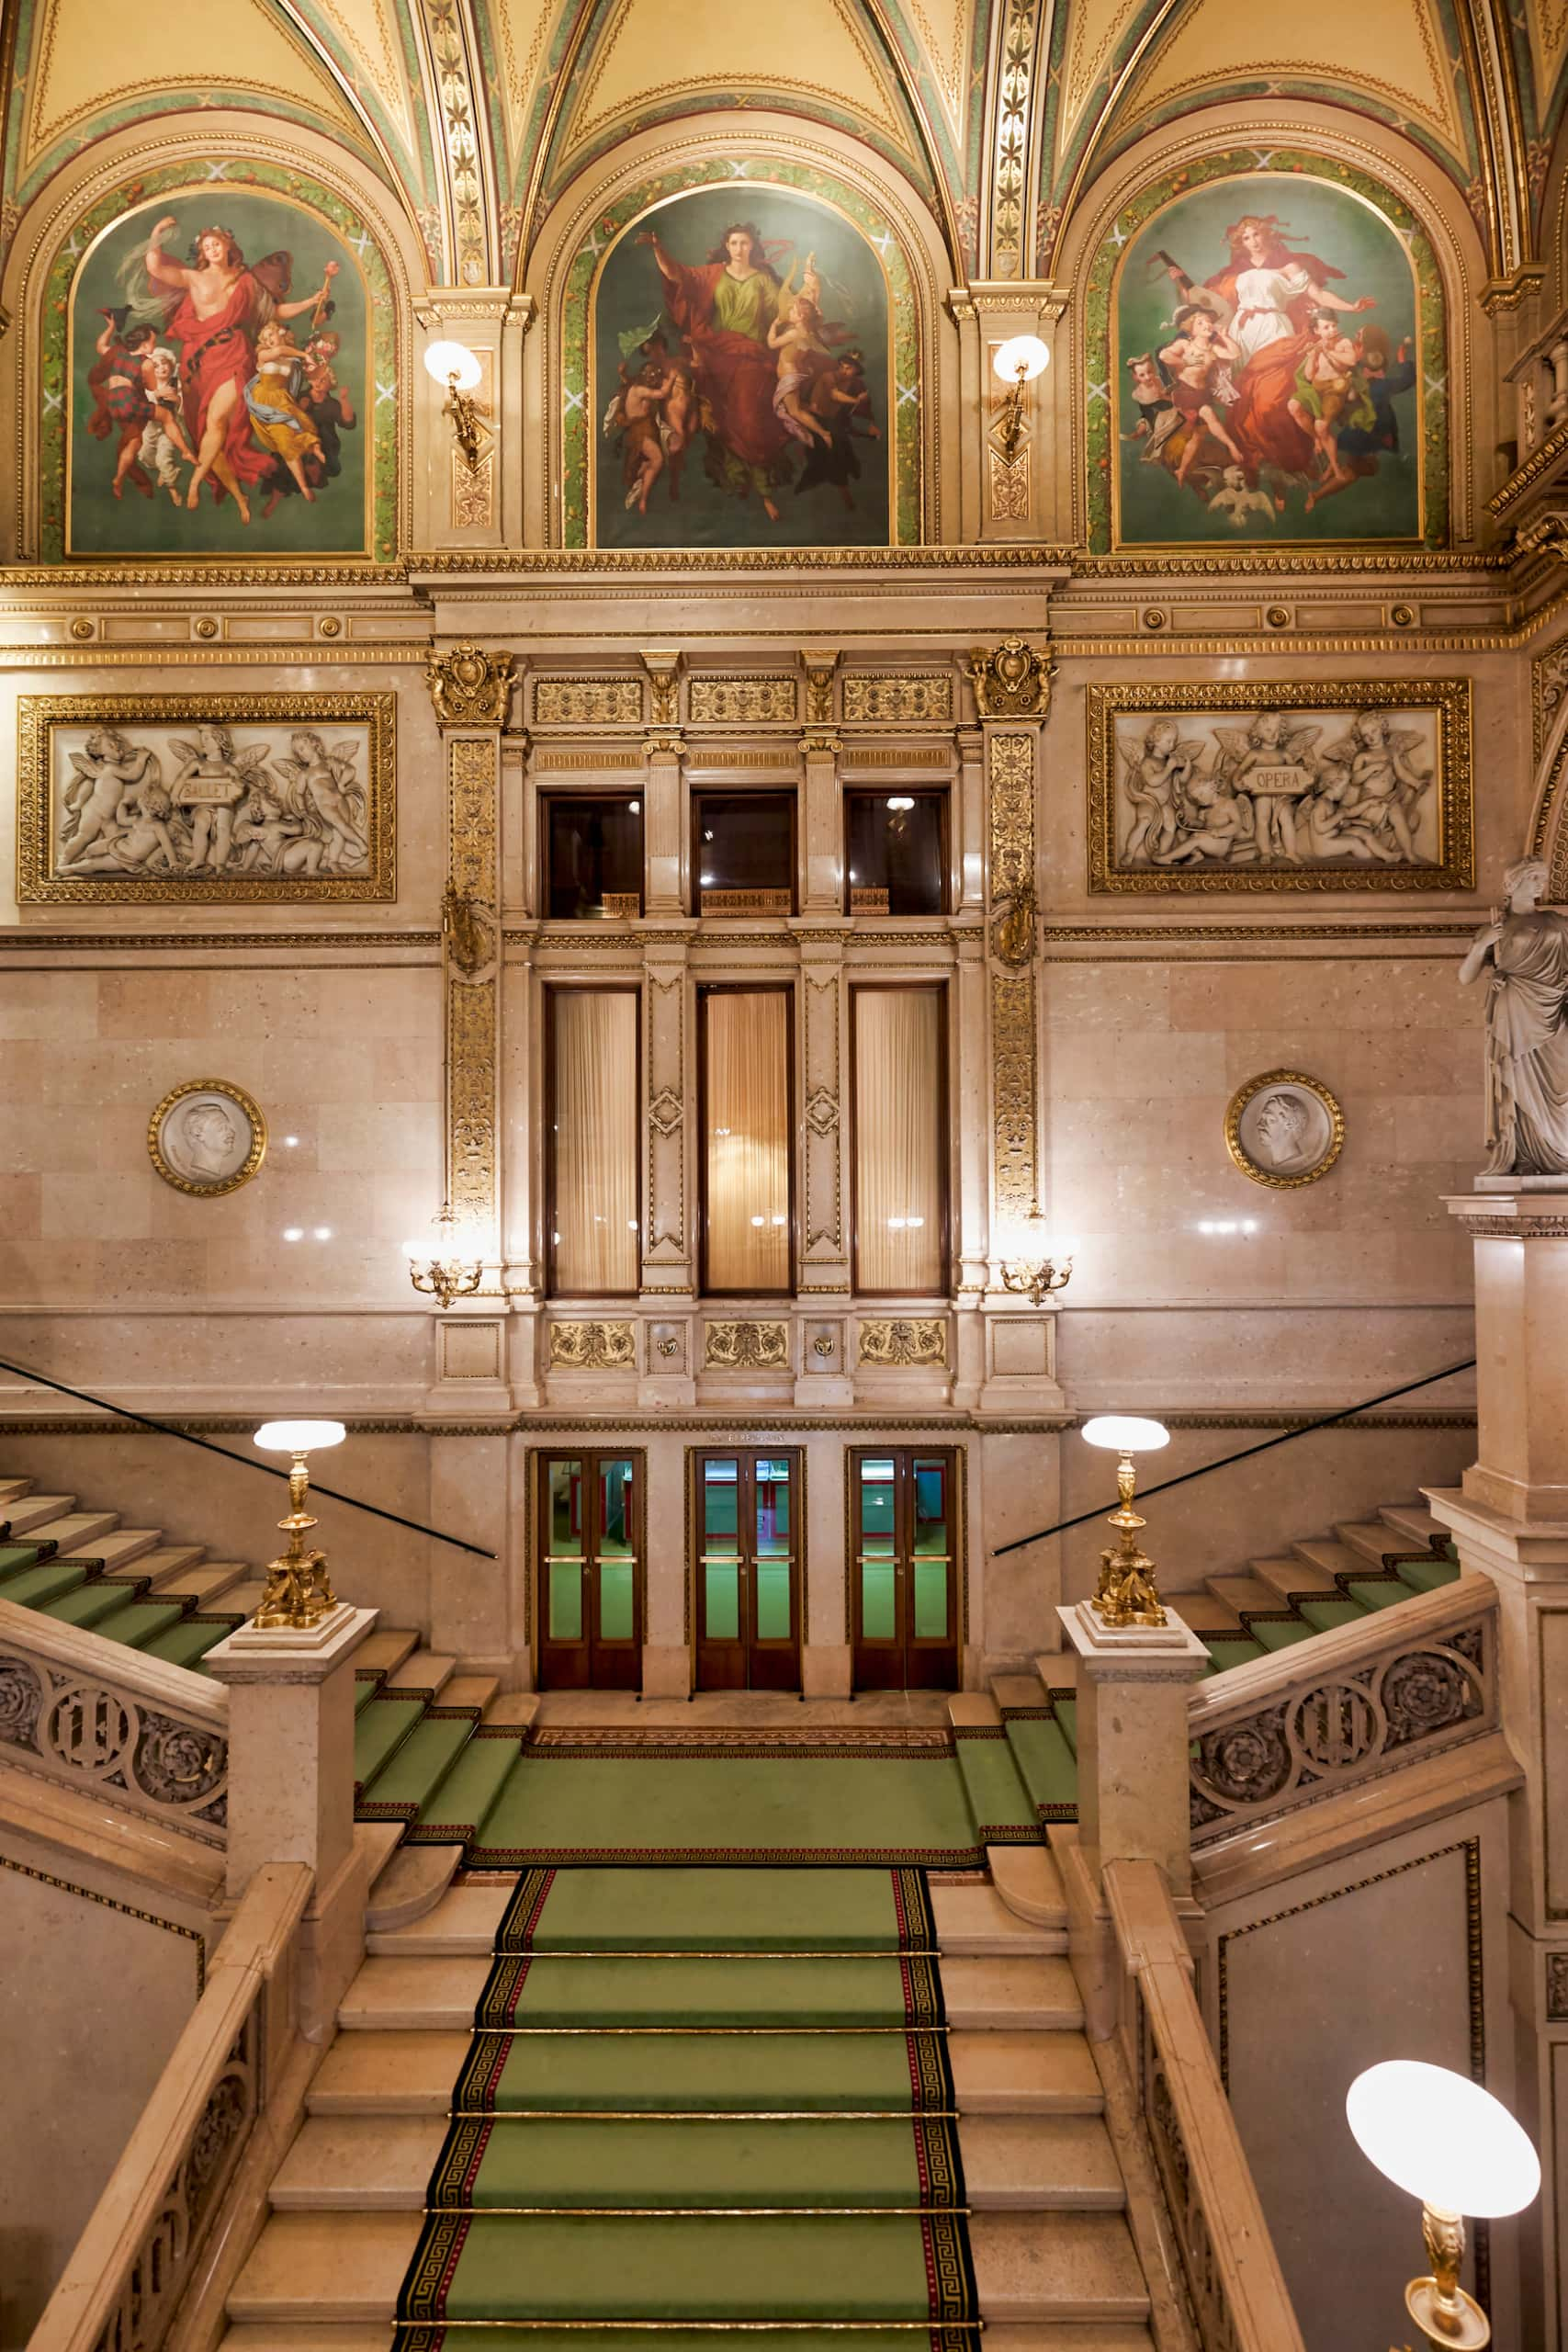 Treppenaufgang in der Wiener Staatsoper